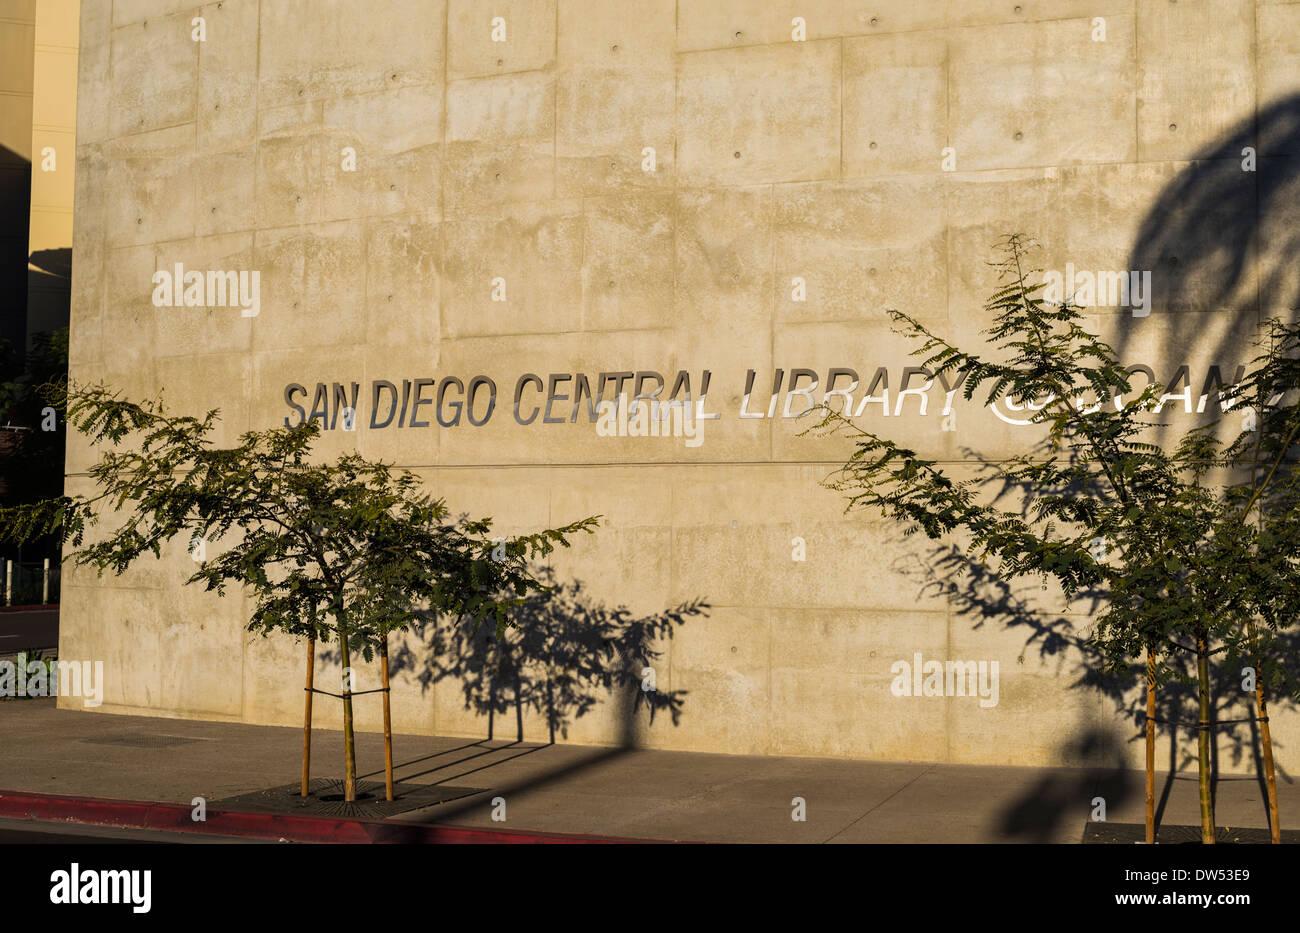 San Diego Central Library Stock Photos & San Diego Central Library ...